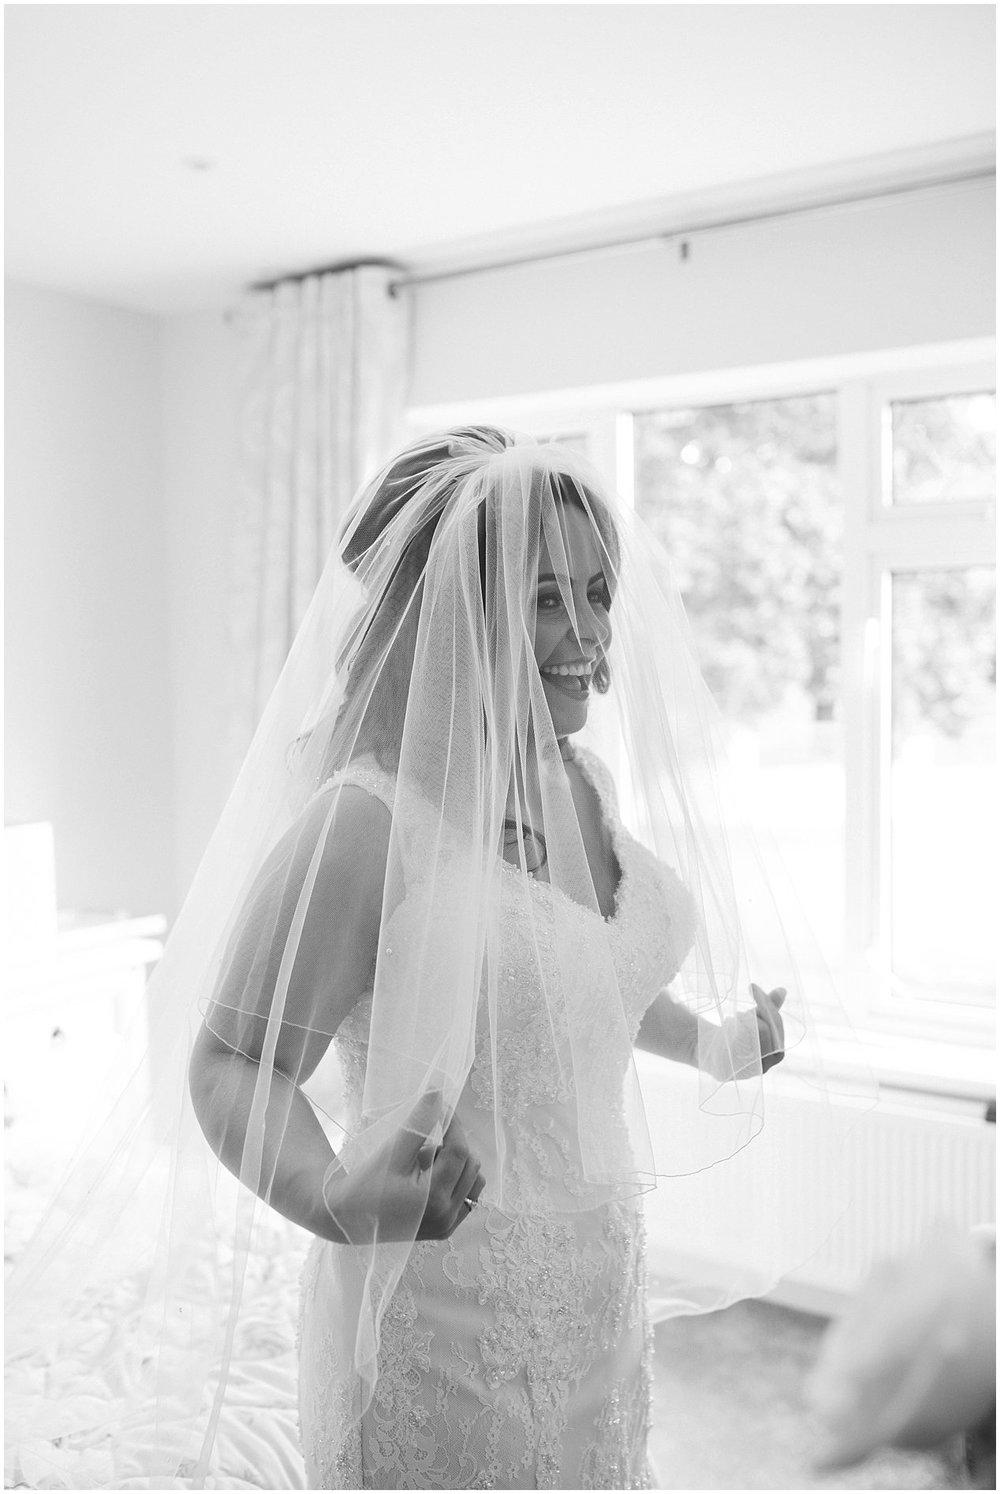 Shauneen_PJ_Hillgrove_Hotel_Monaghan_Wedding_jude_browne_photography_0013.jpg